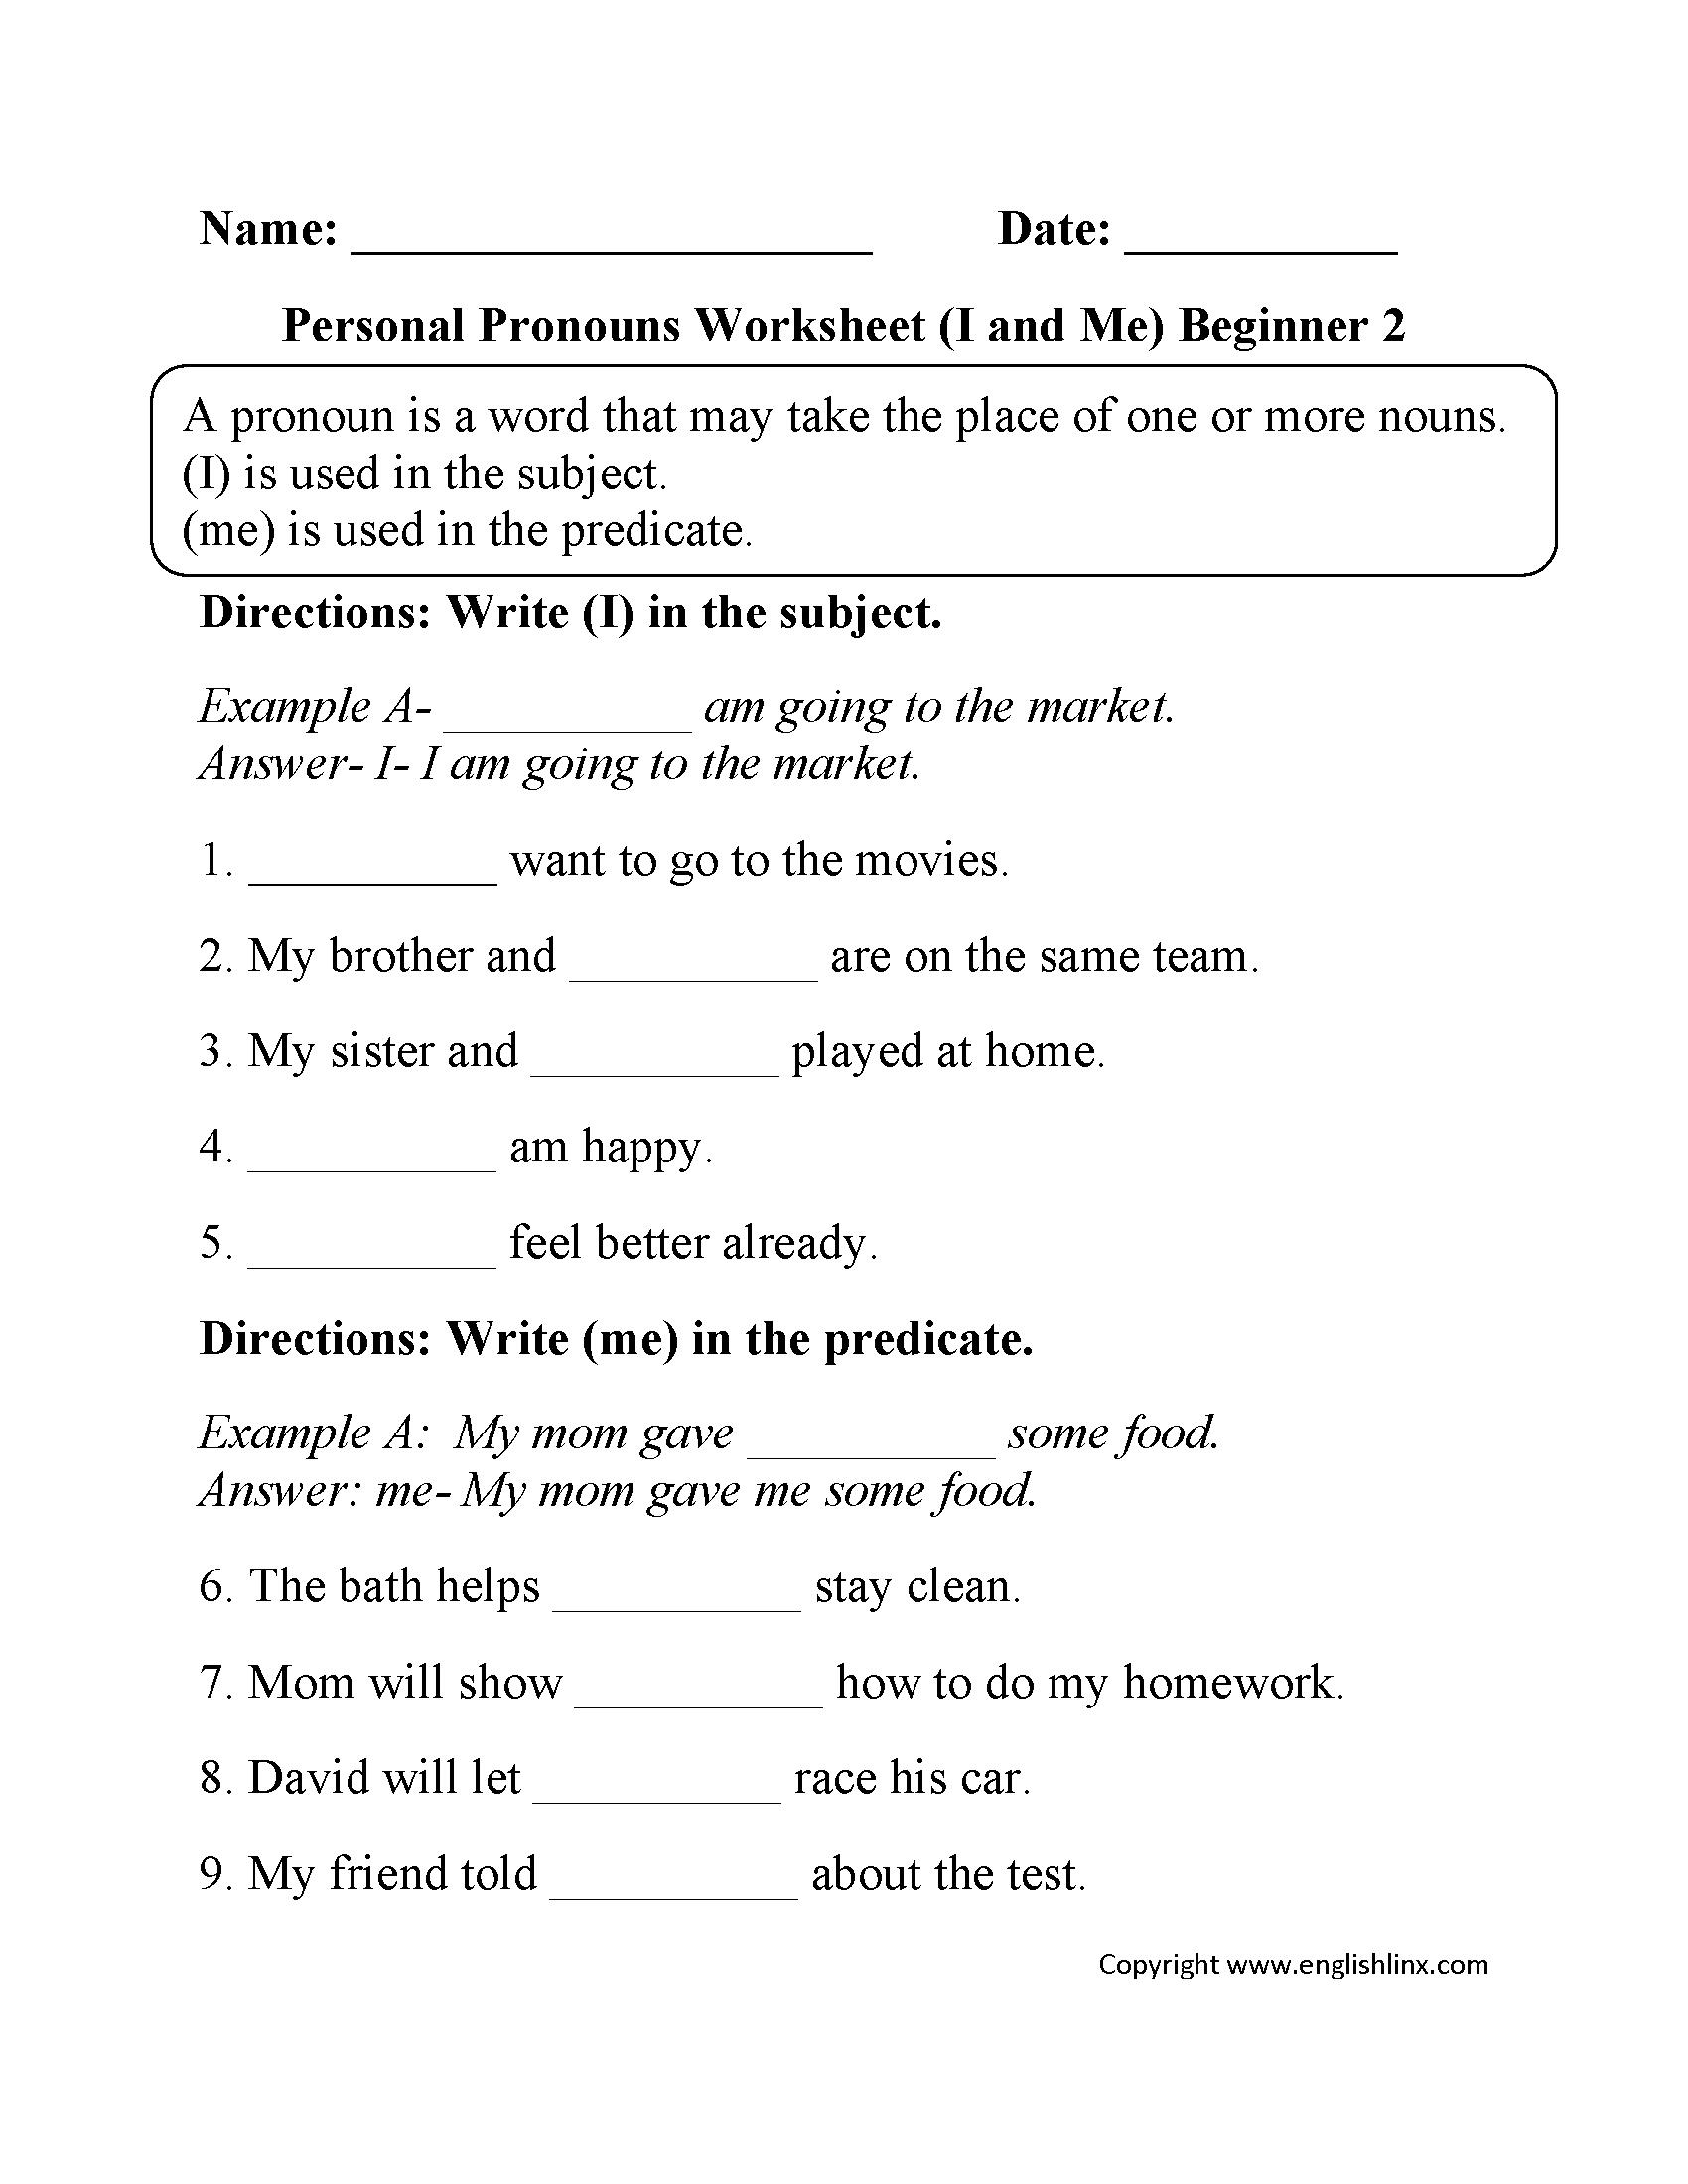 Pronoun Worksheet Six Grade   Printable Worksheets and Activities for  Teachers [ 2200 x 1700 Pixel ]